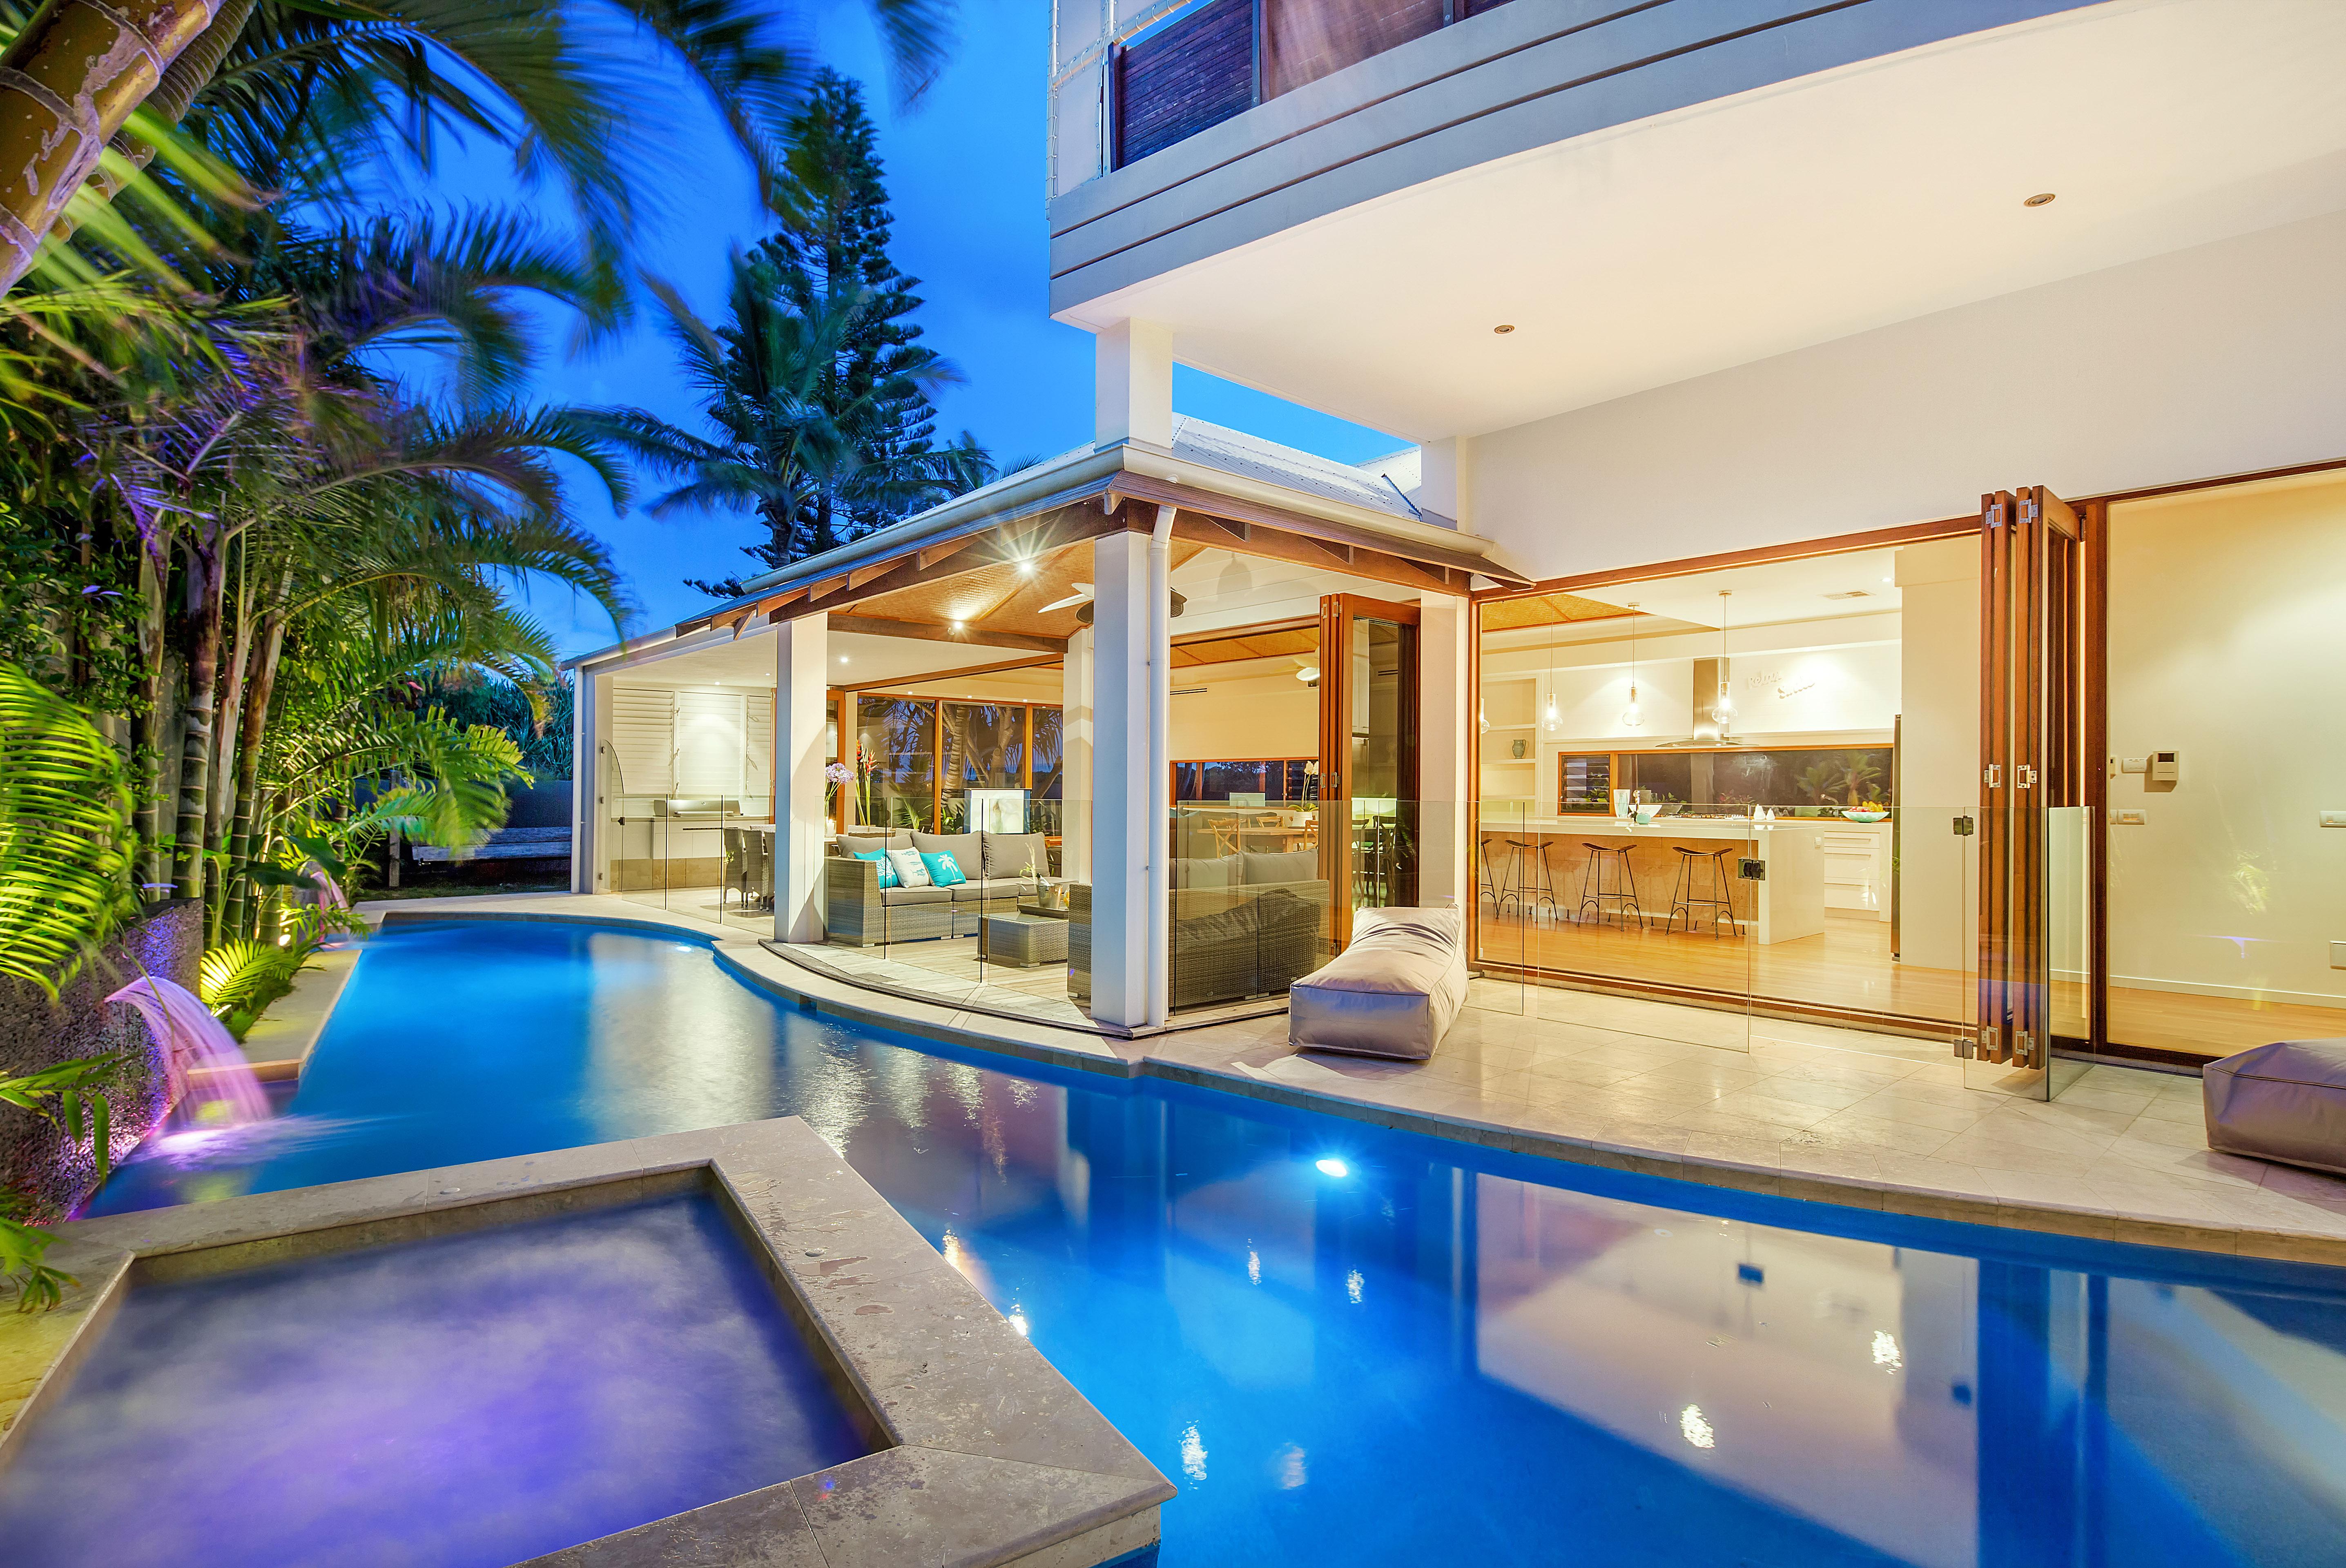 Award winning luxury in noosa for Award winning house plans 2015